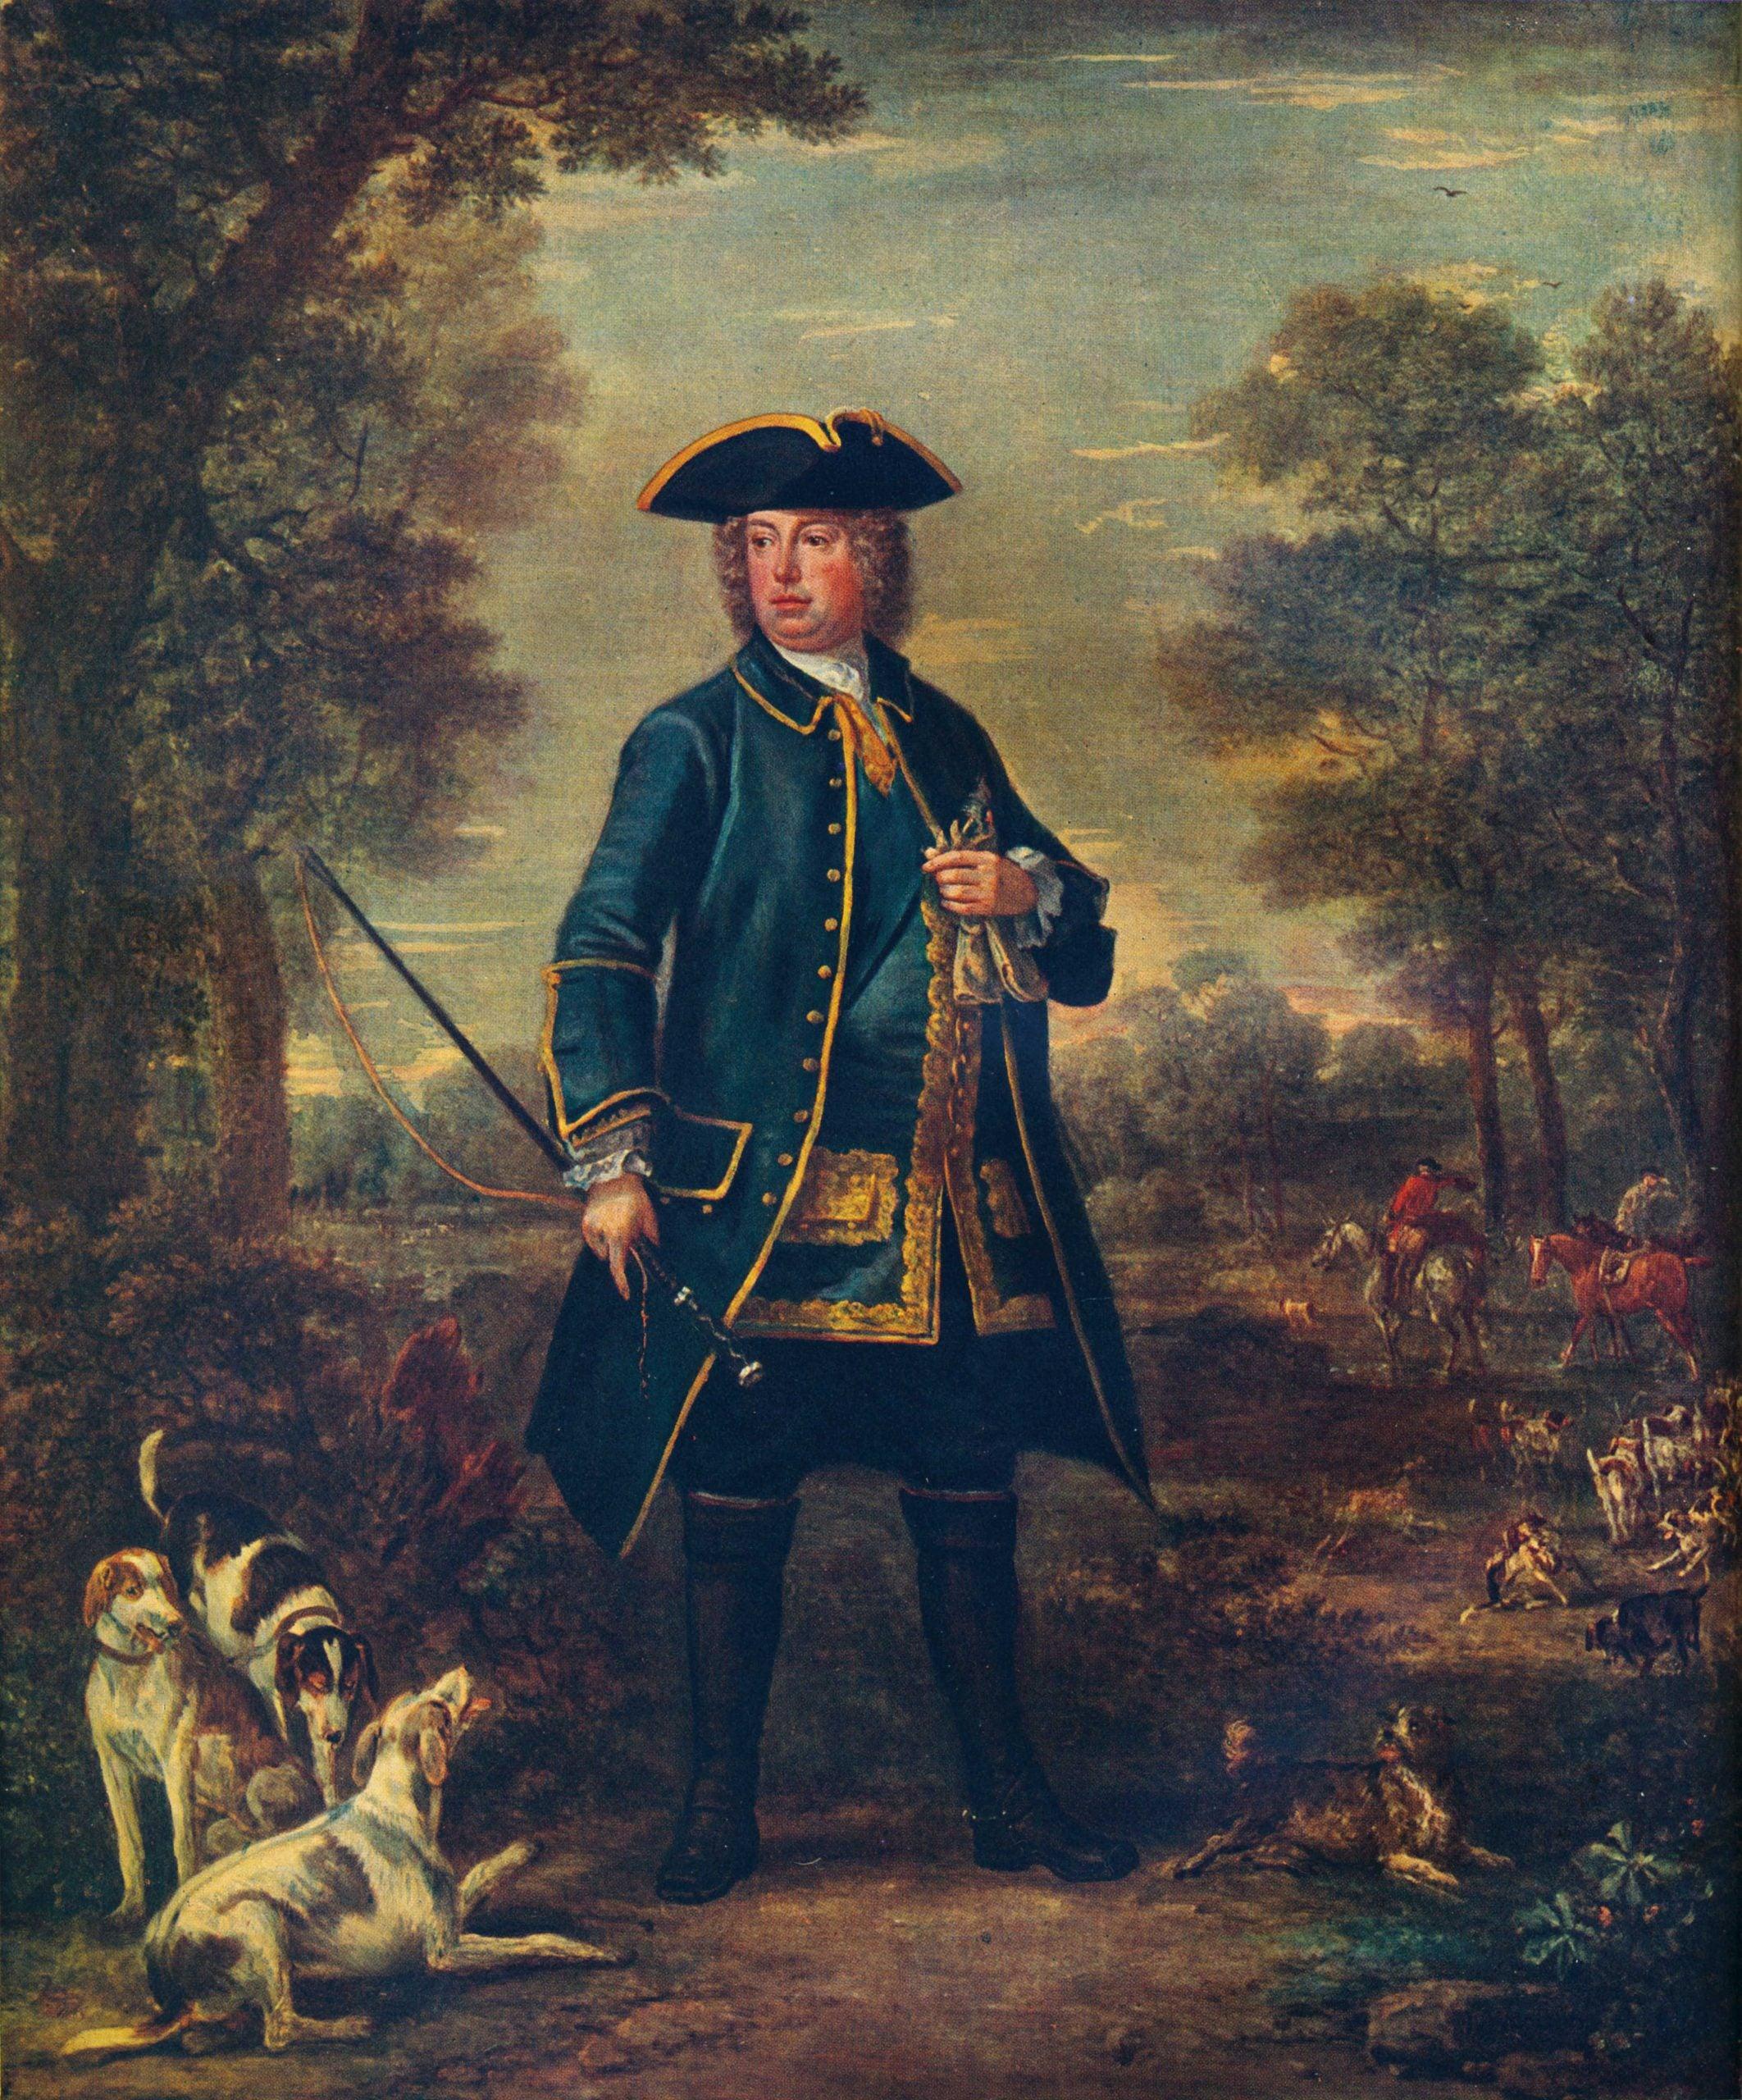 No saint, no spartan, no reformer: the life of Robert Walpole